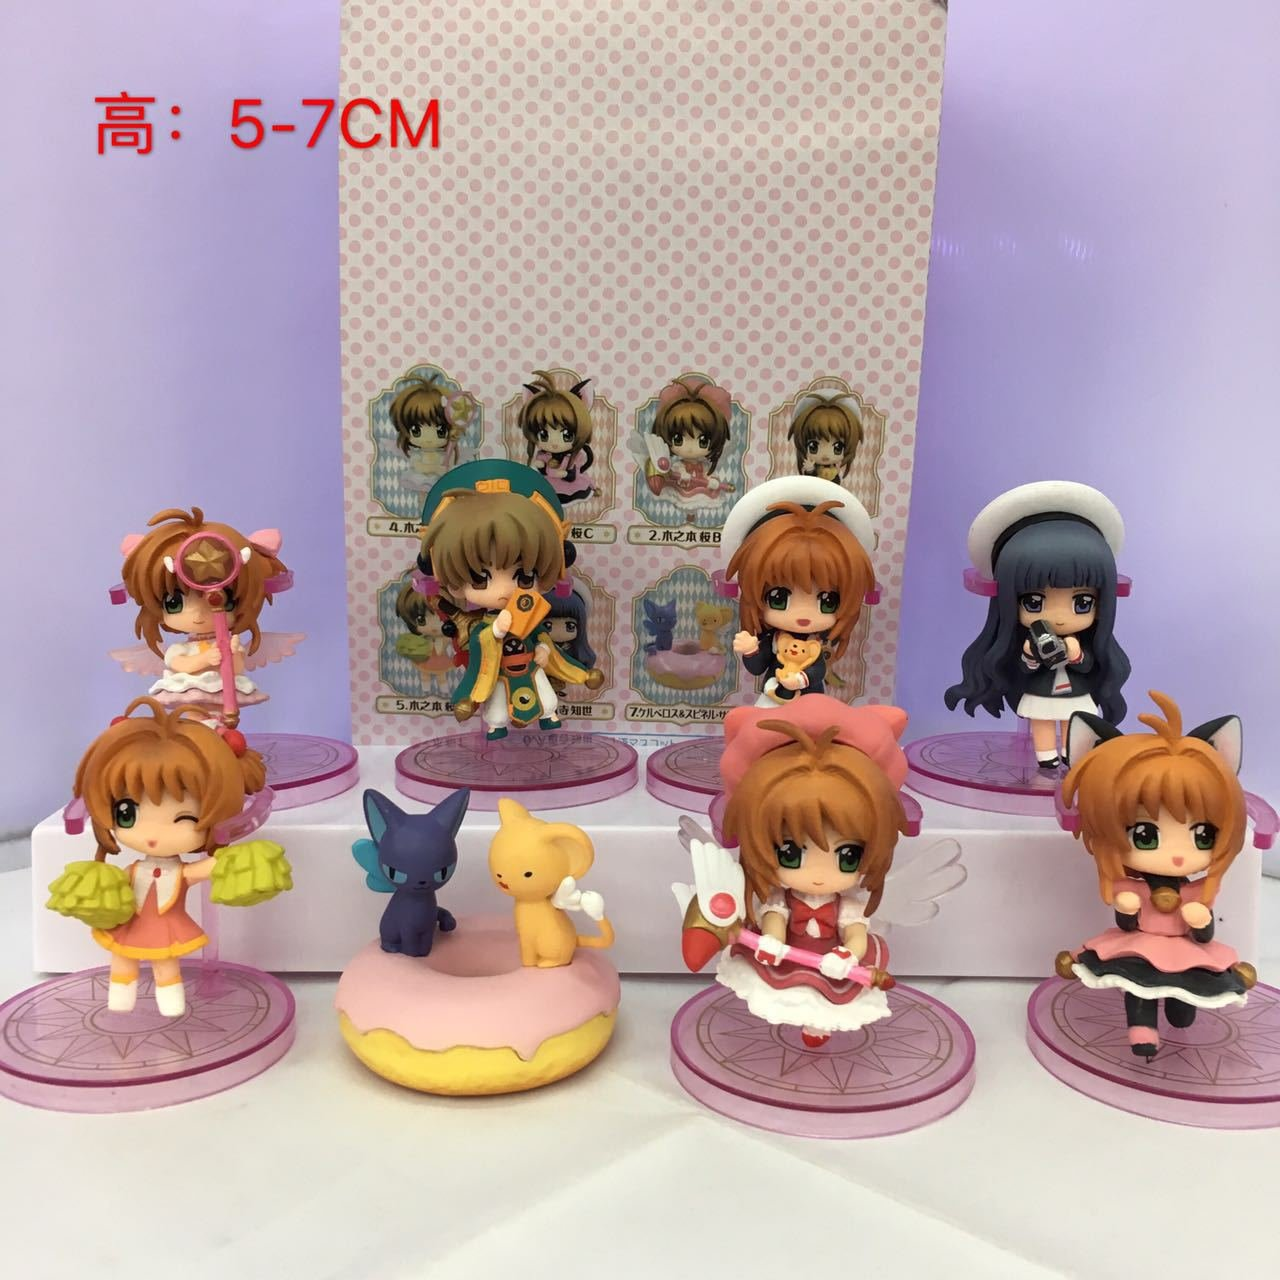 Amazon.com: 8pc/set Anime Card Captor Sakura PVC cifras ...